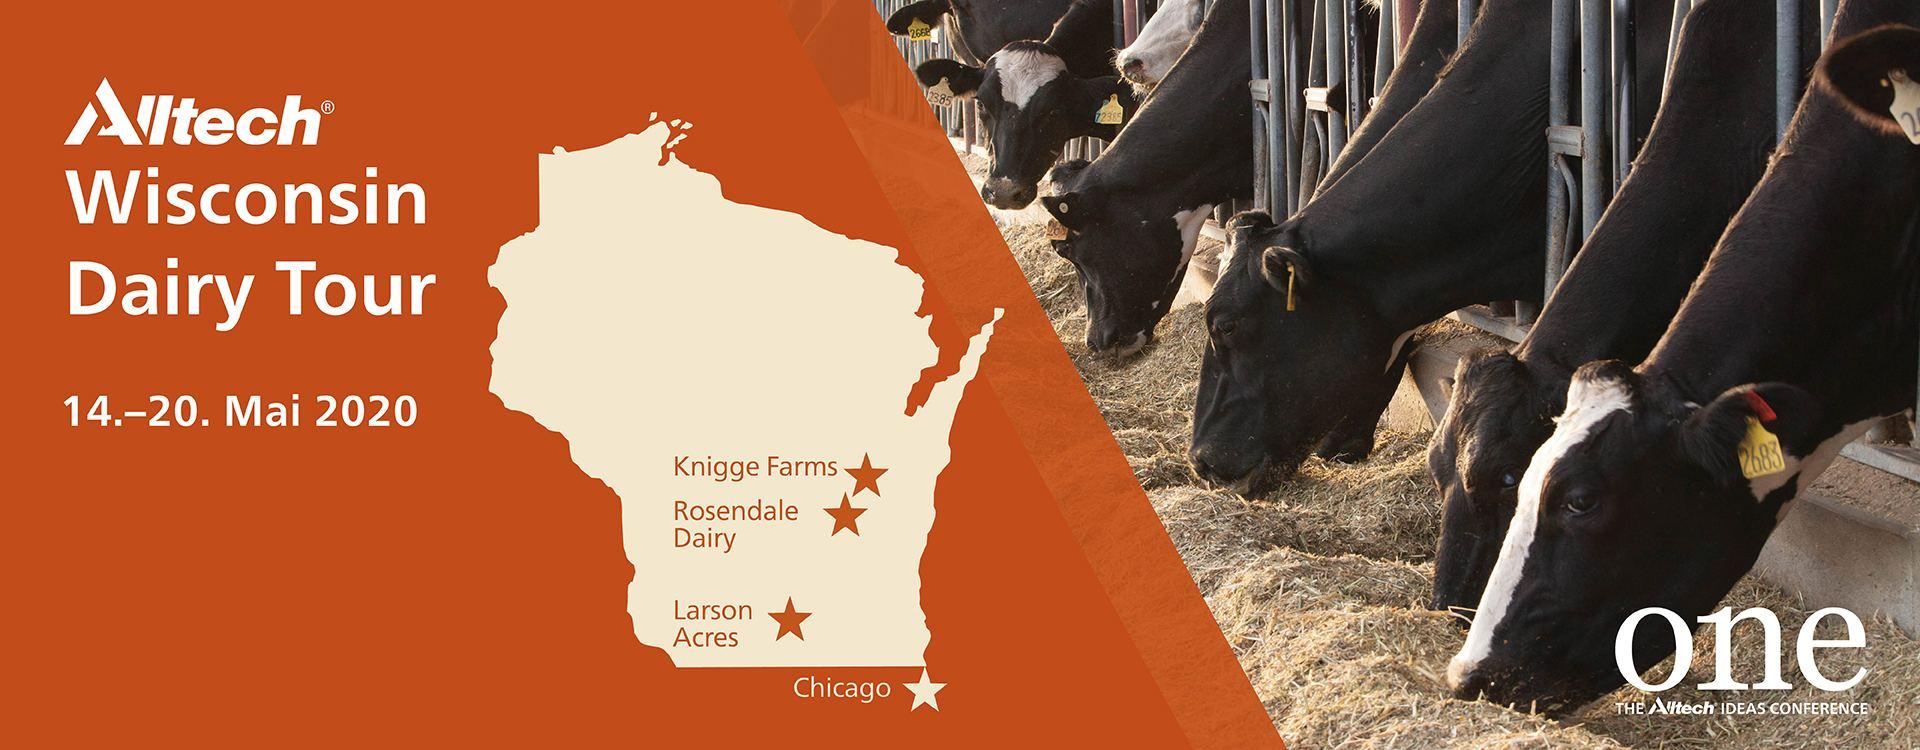 Wisconsin dairy tour Germany